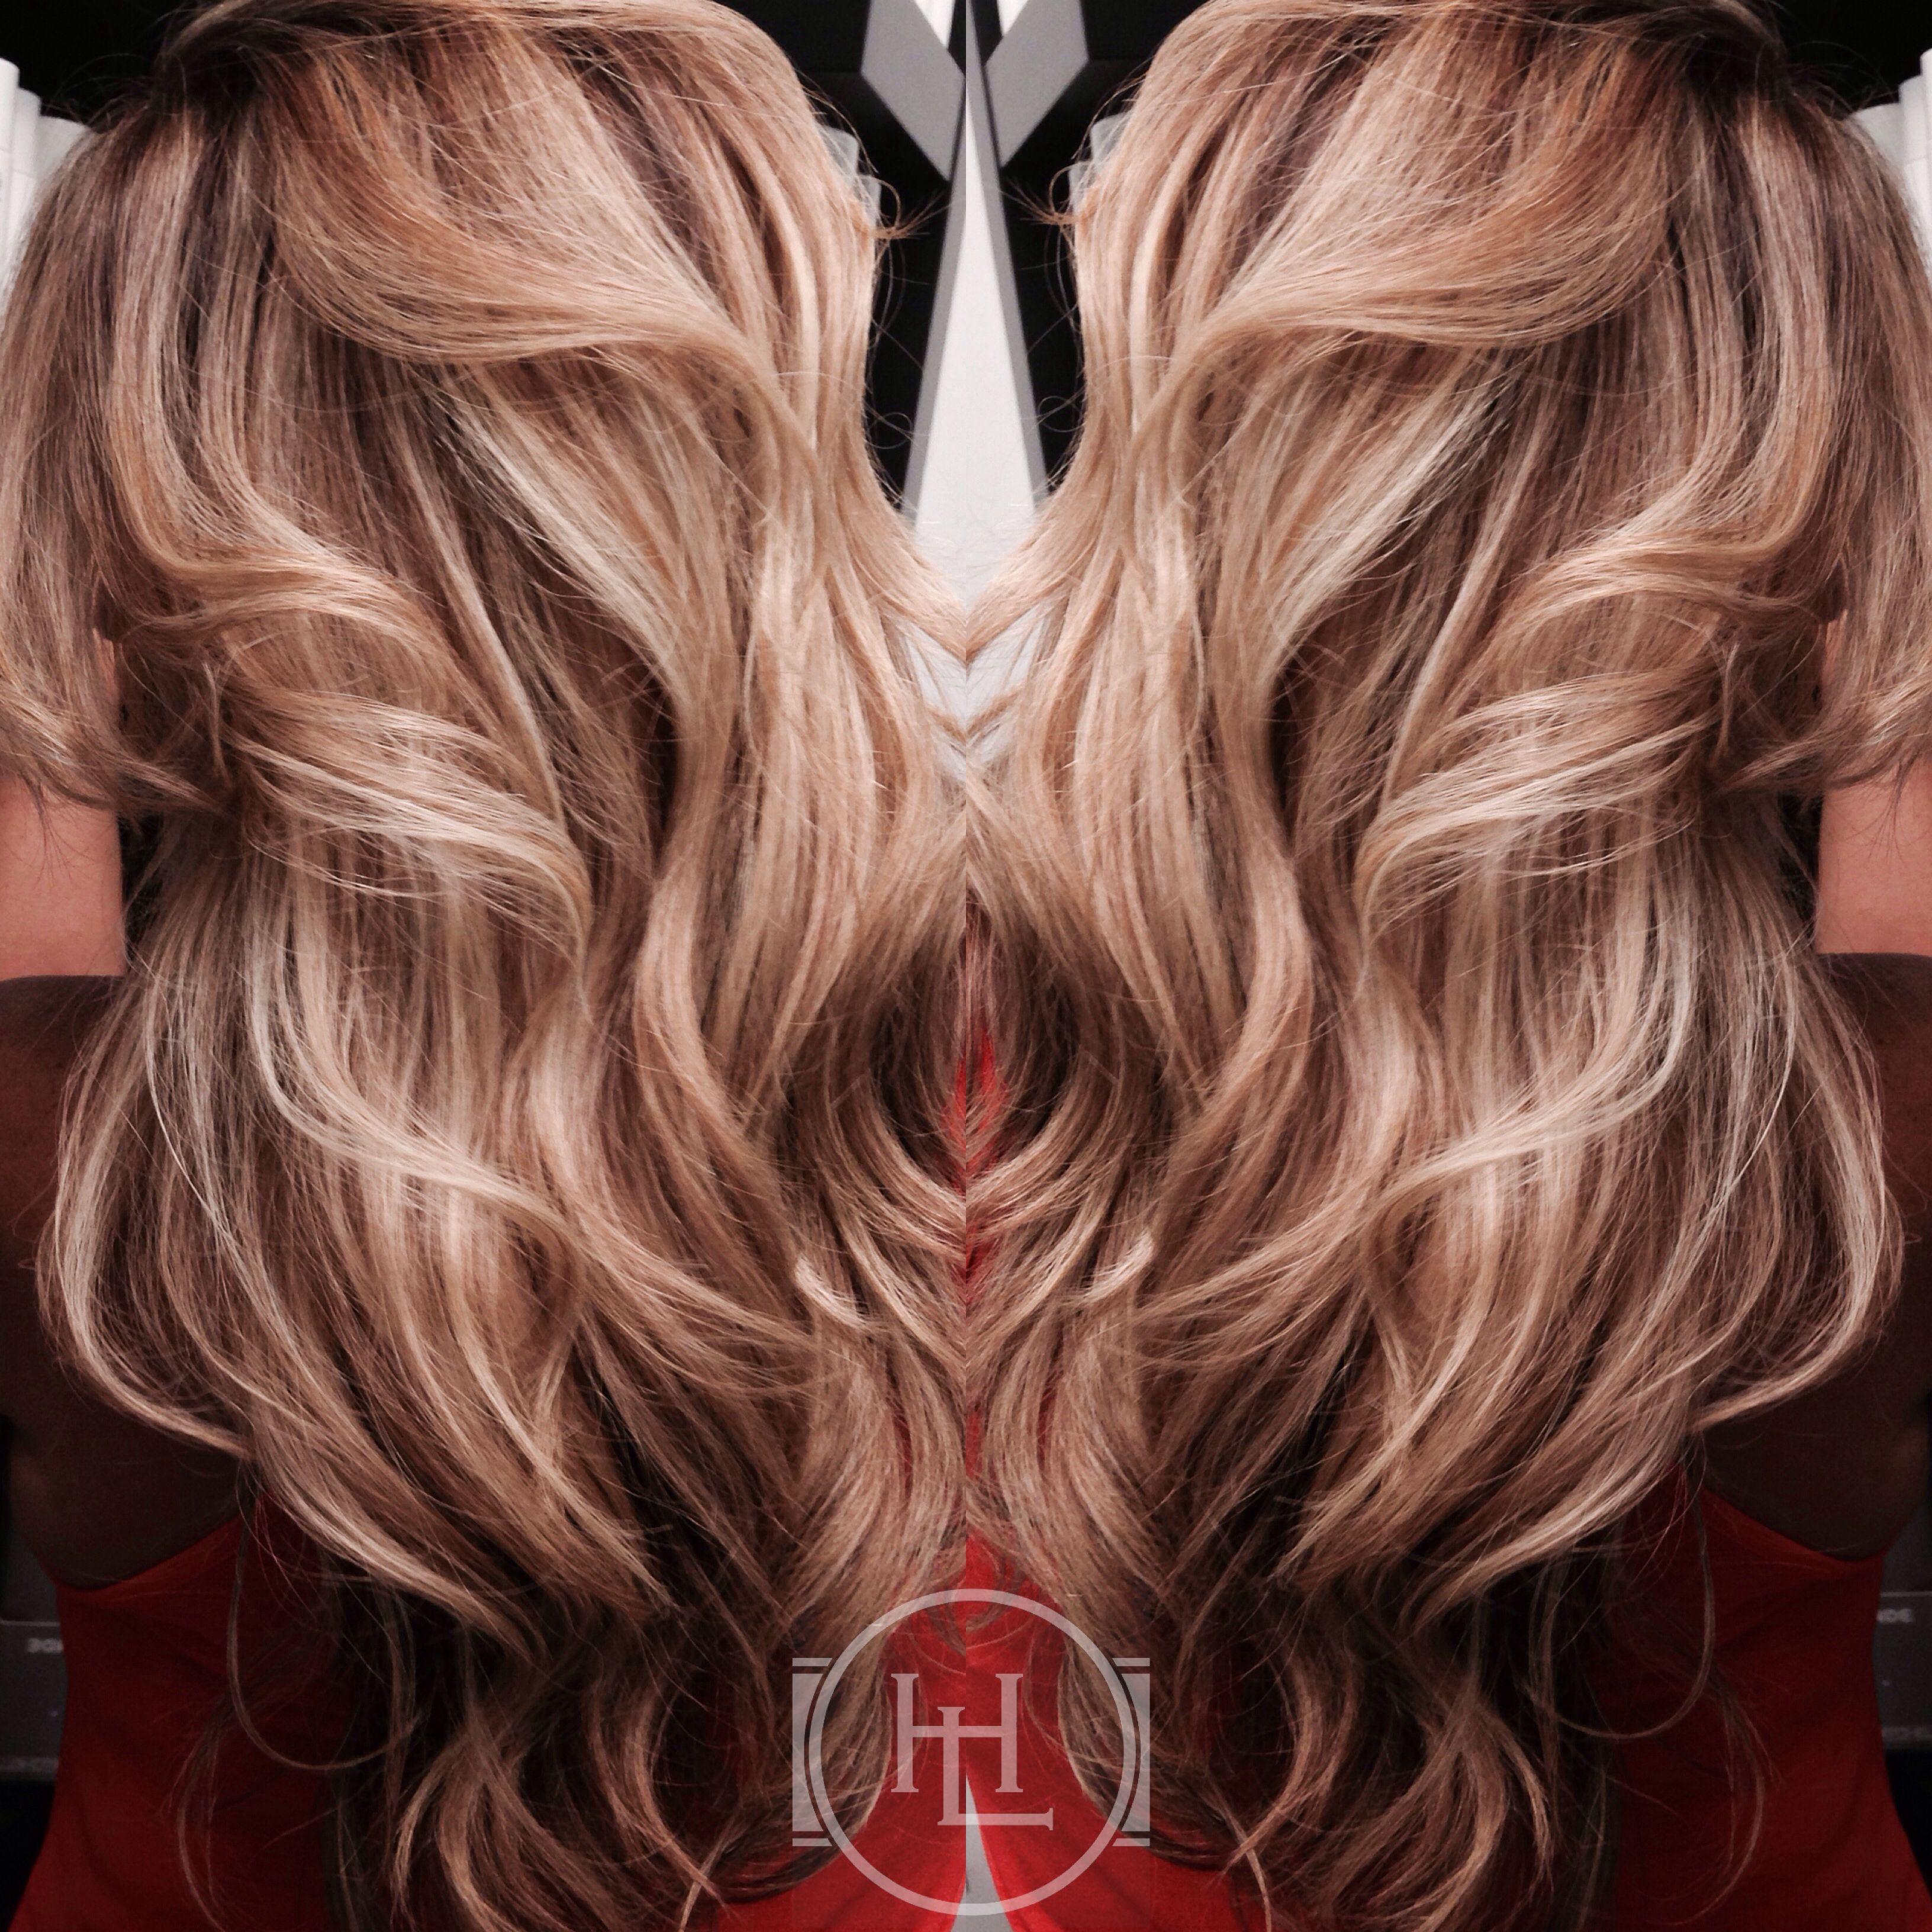 Smokey Pearl hair by: Emilio V. #hairlegacy #hairbyemilio #miamisalon #haircolor #haircut #hair #hairstylist #pictureoftheday #paulmitchellinternational #miami #miramar #mypassion #beautymall  #broward #balayage #softbalayage #paulmitchellfocussalon   #healthyhair #paulmitchelllatinamerica #treatyourhairwithkindness #nofilter #nohairextensions #naturalhair #hairbeauty #pmshines #shinesxg #vibrant #photo #passionforcolor #extrabody